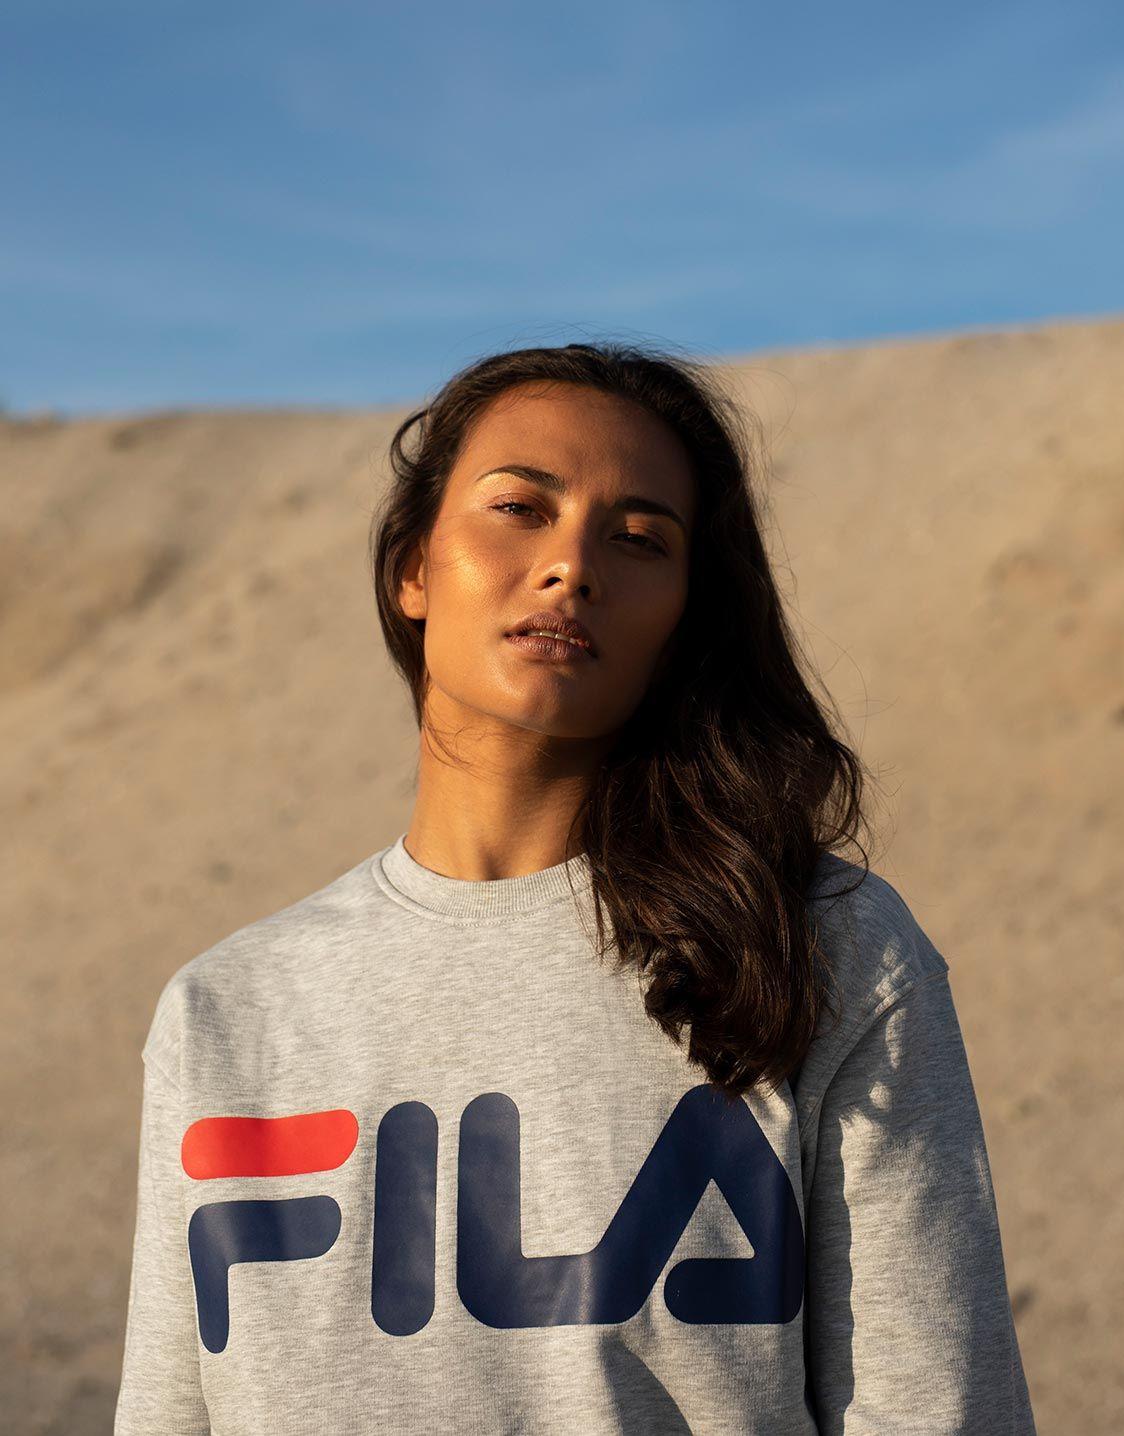 d66737ae4a83 FILA Classic logo sweater light grey   Fila   Fashion, Womens ...